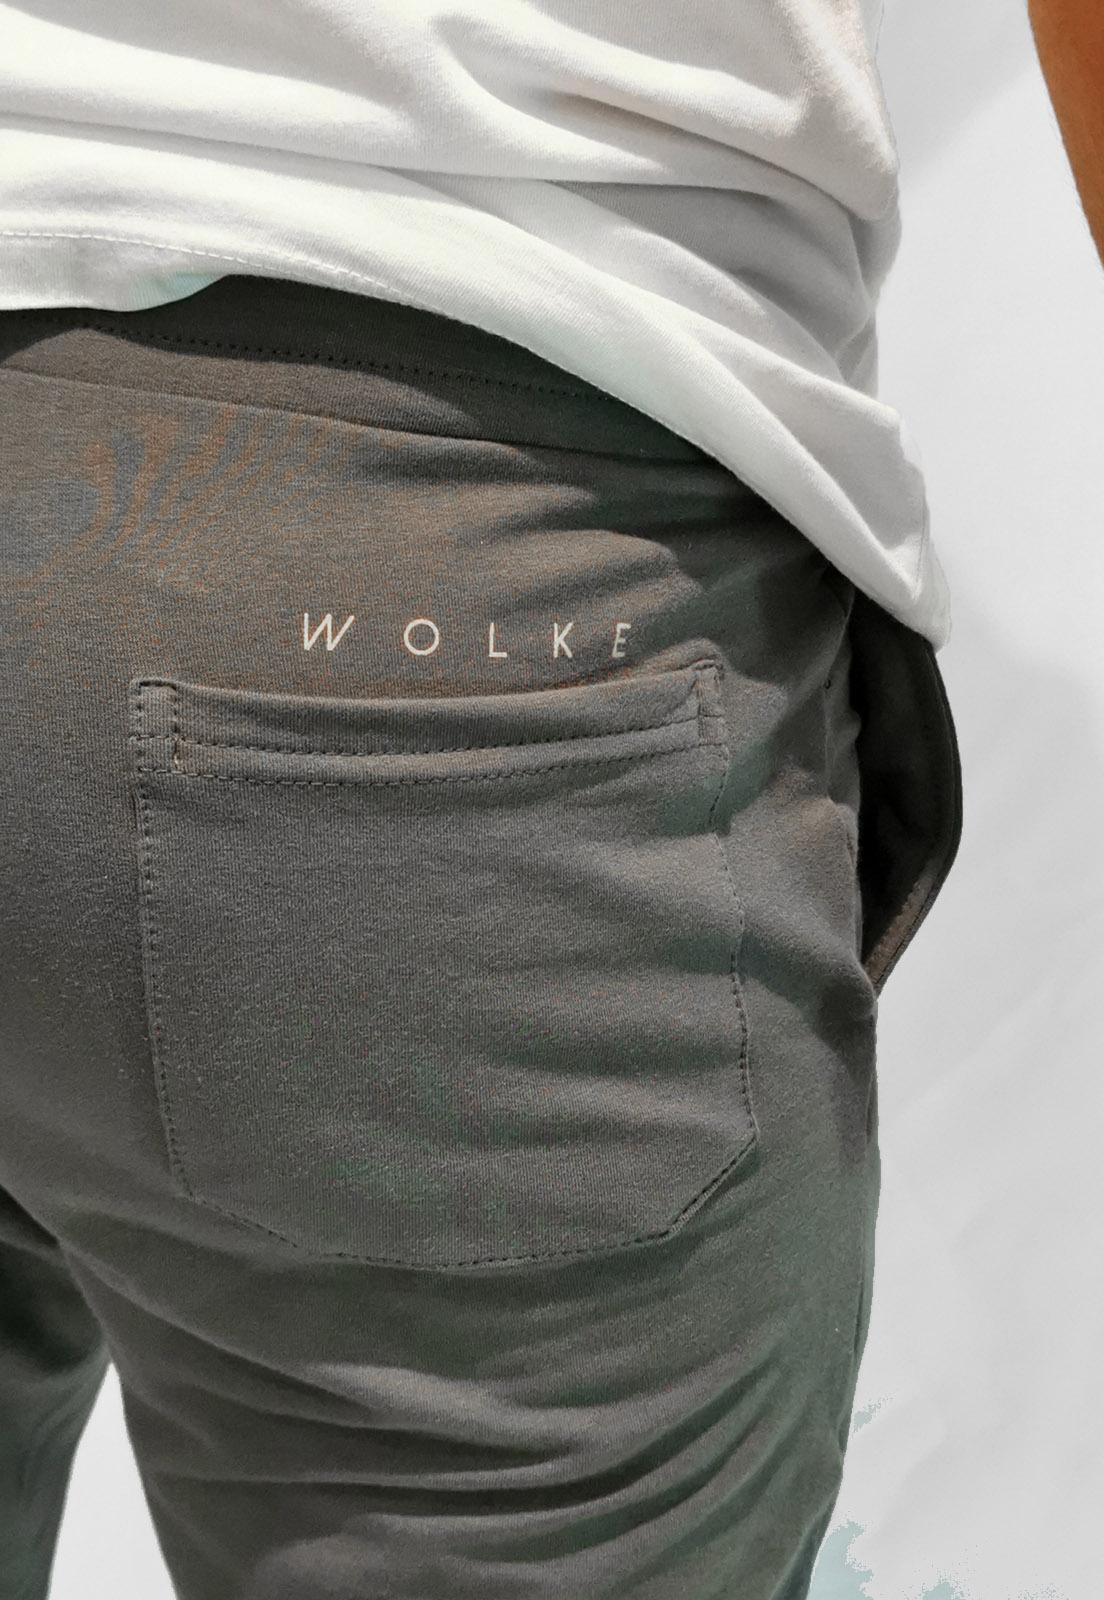 Calça Molecoton Wolke Cinza Evolve